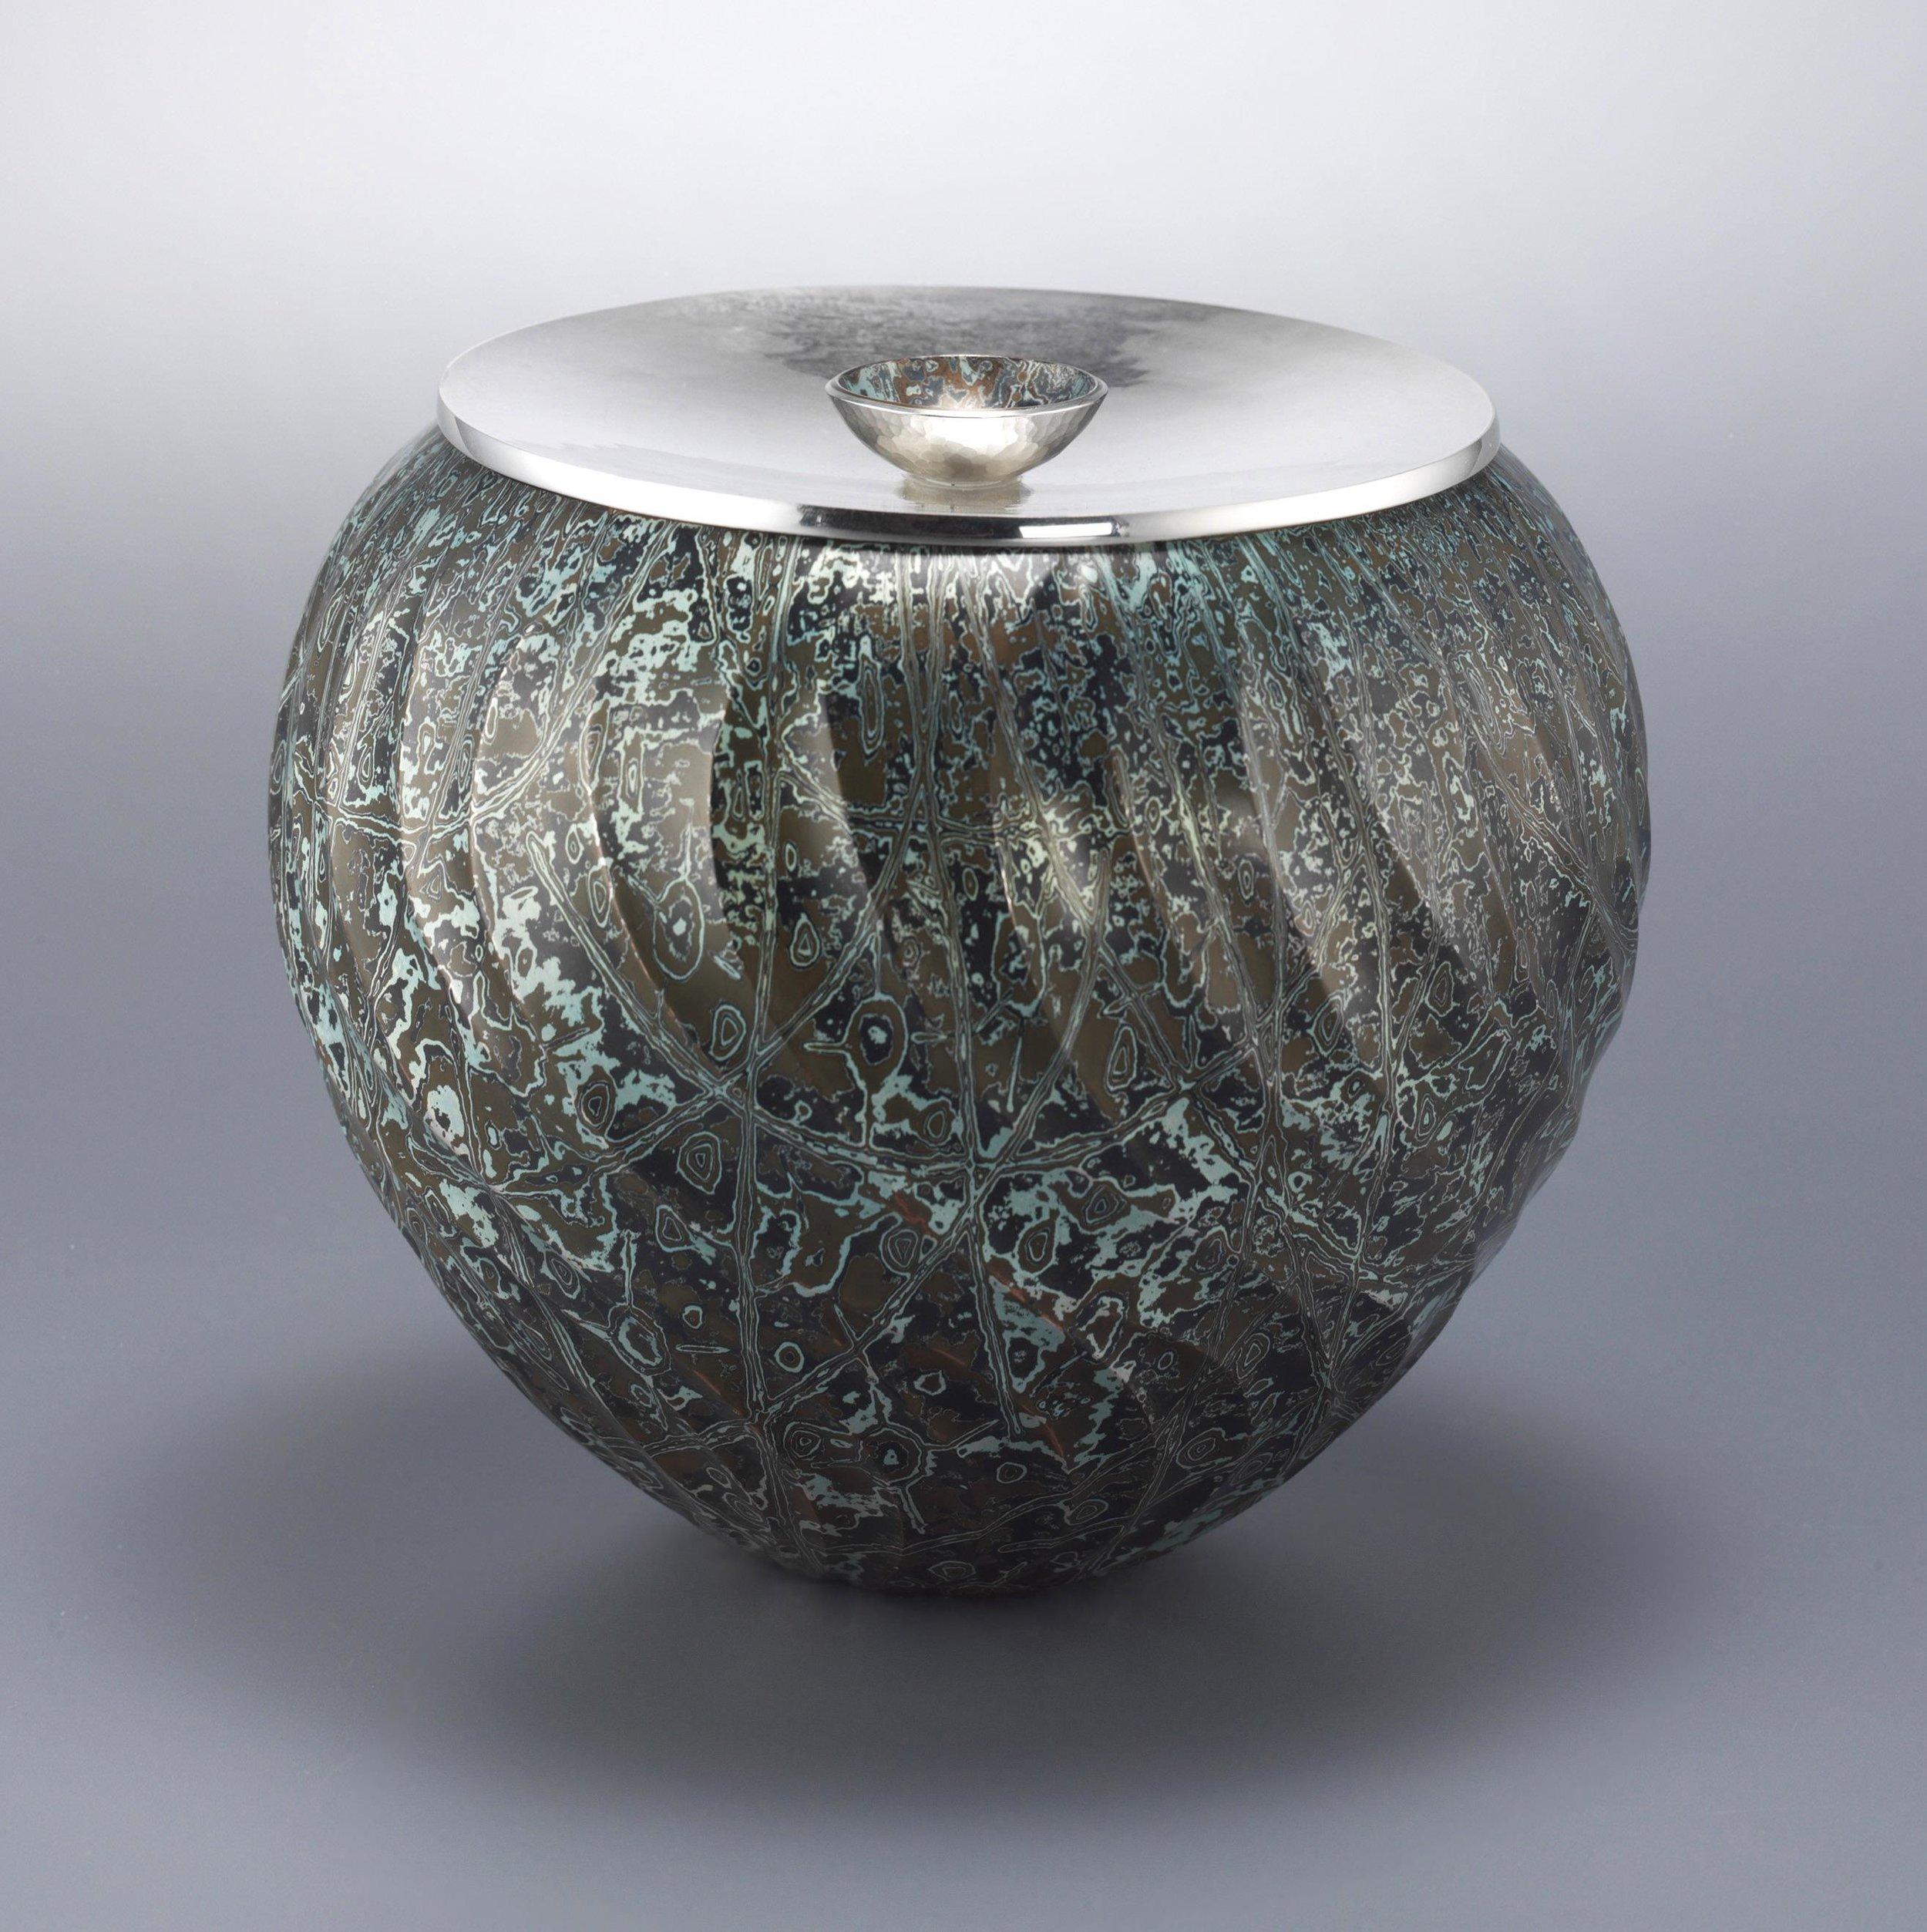 2011-SBDA-Hollowware-1st Place (Grand Prize)-Wayne Meeten-0_lg.jpg